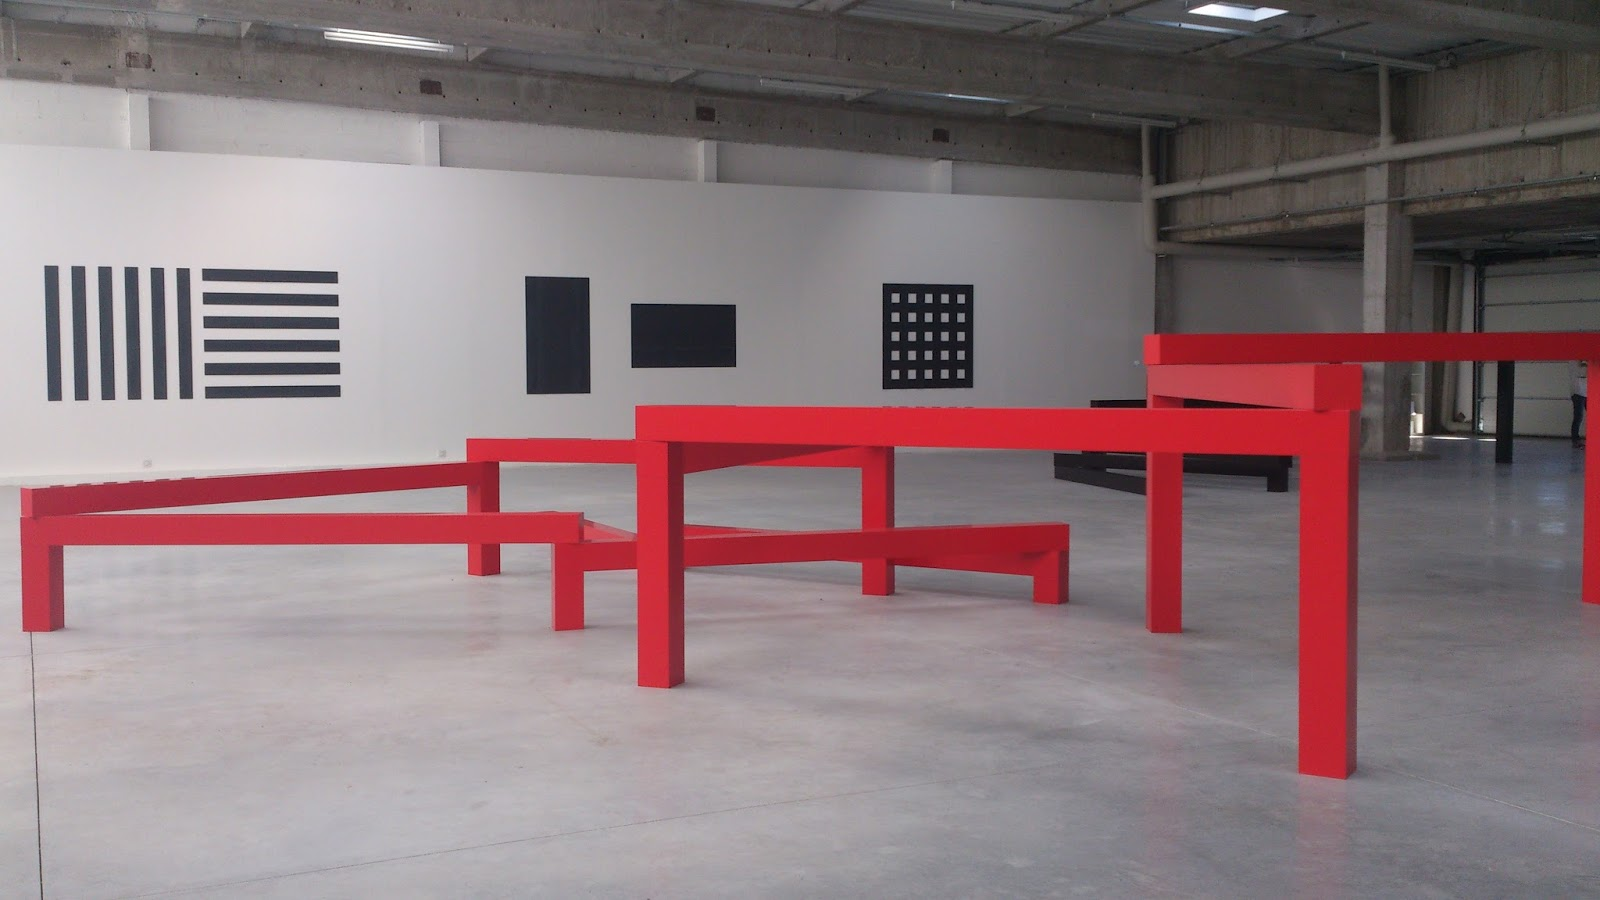 fran ois morellet 5x3 la regla del juego camilayelarte. Black Bedroom Furniture Sets. Home Design Ideas